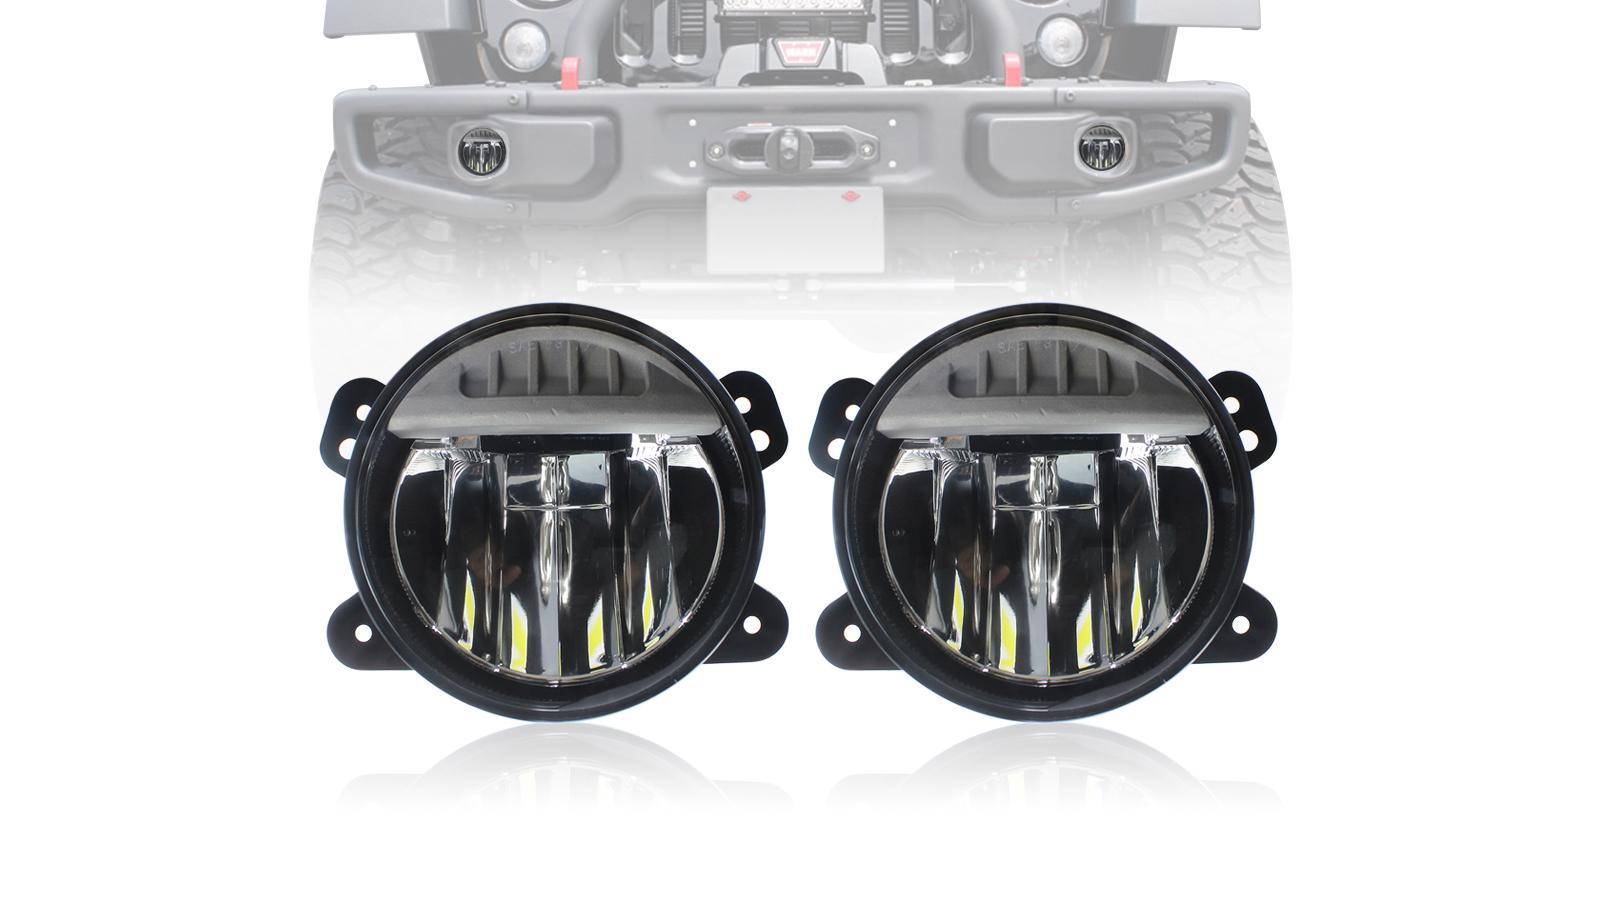 4 inch LED Fog Lights Assembly Kit Bumper Lamps for Jeep Wrangler JL 2018-2020